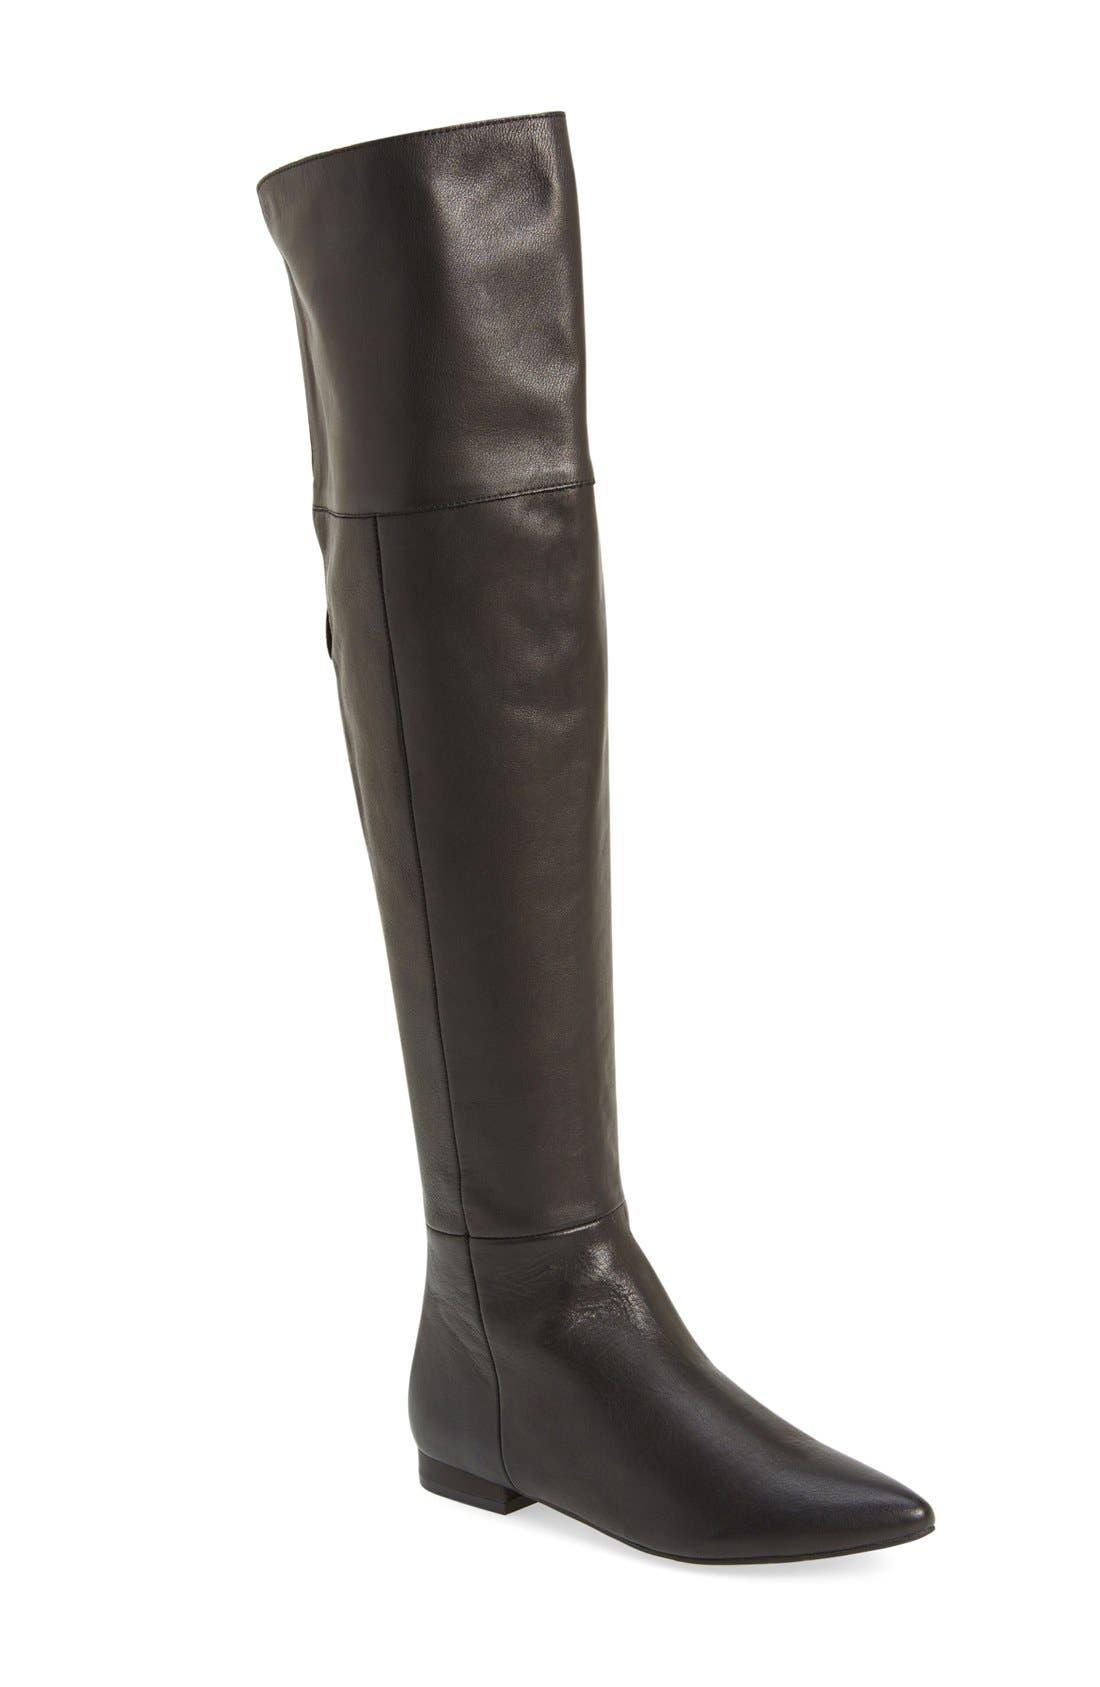 Alternate Image 1 Selected - Kristin Cavallari'York' Over the Knee Boot (Women)